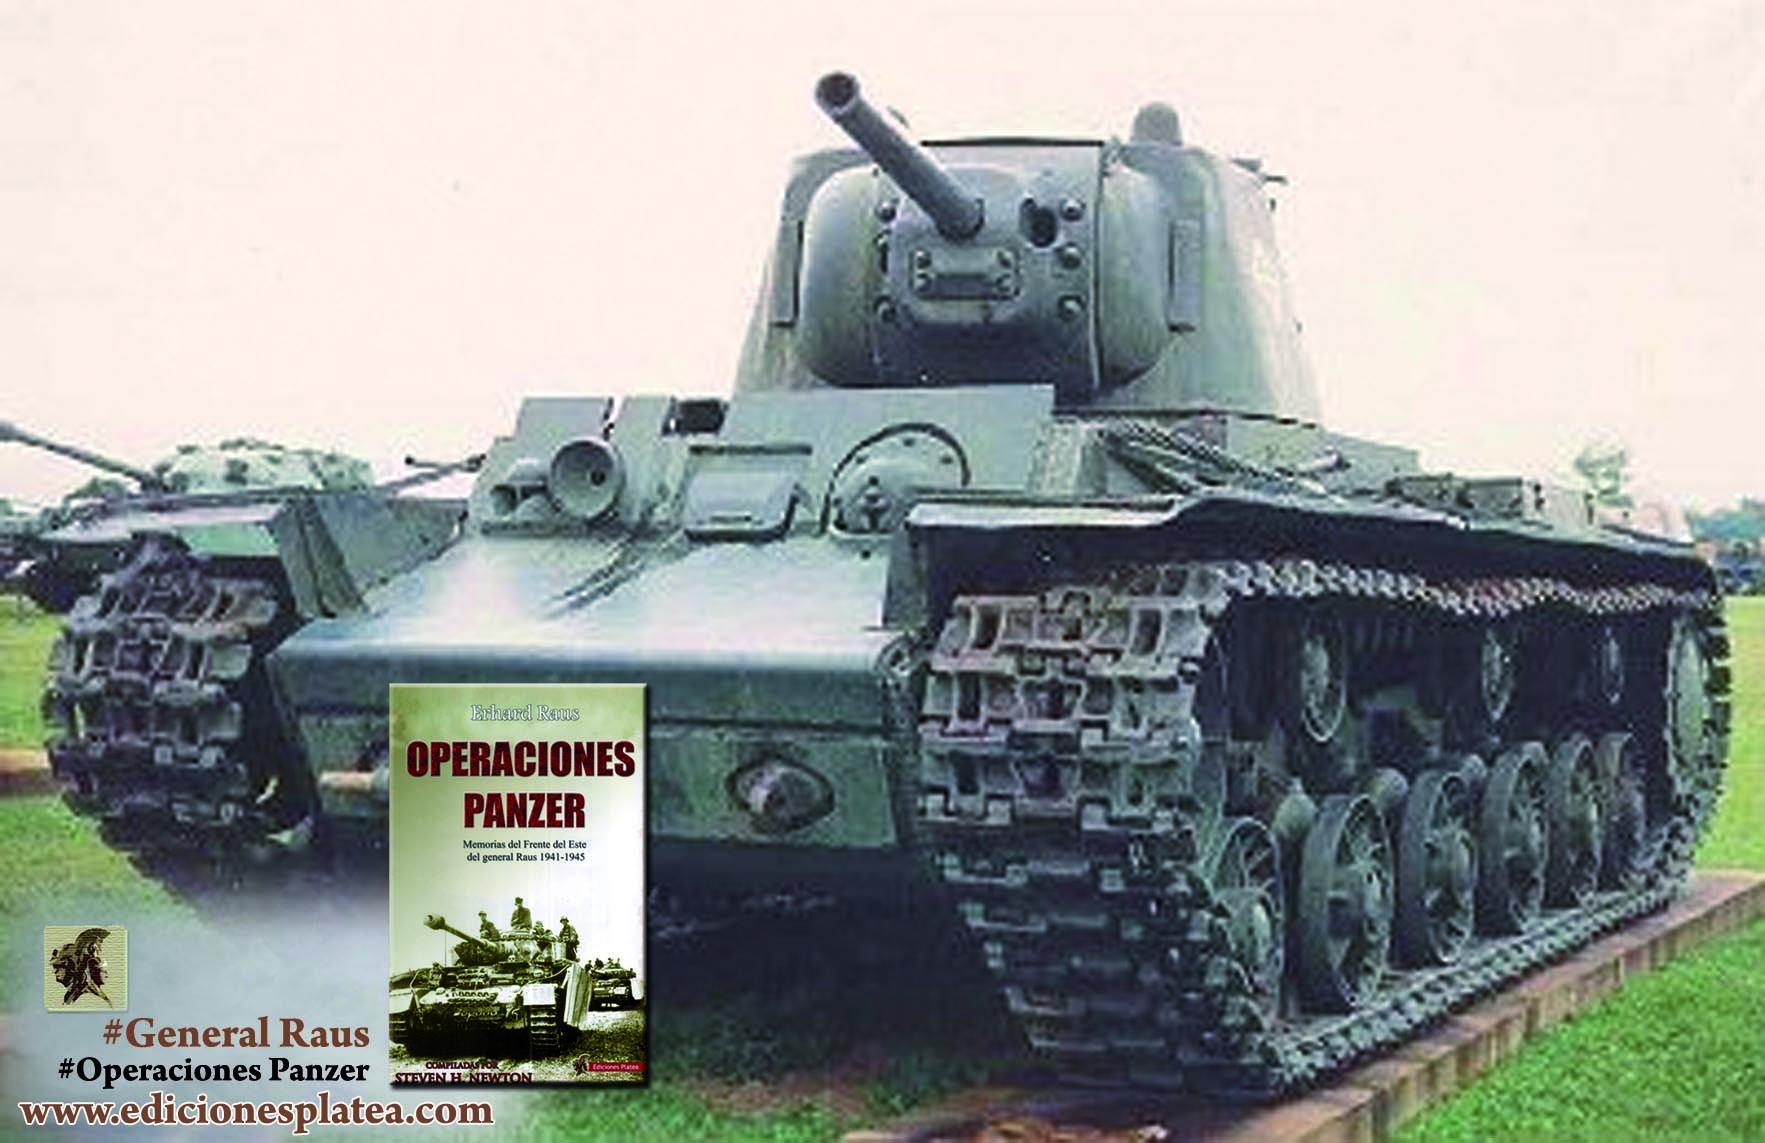 Operaciones Panzer Raus-4